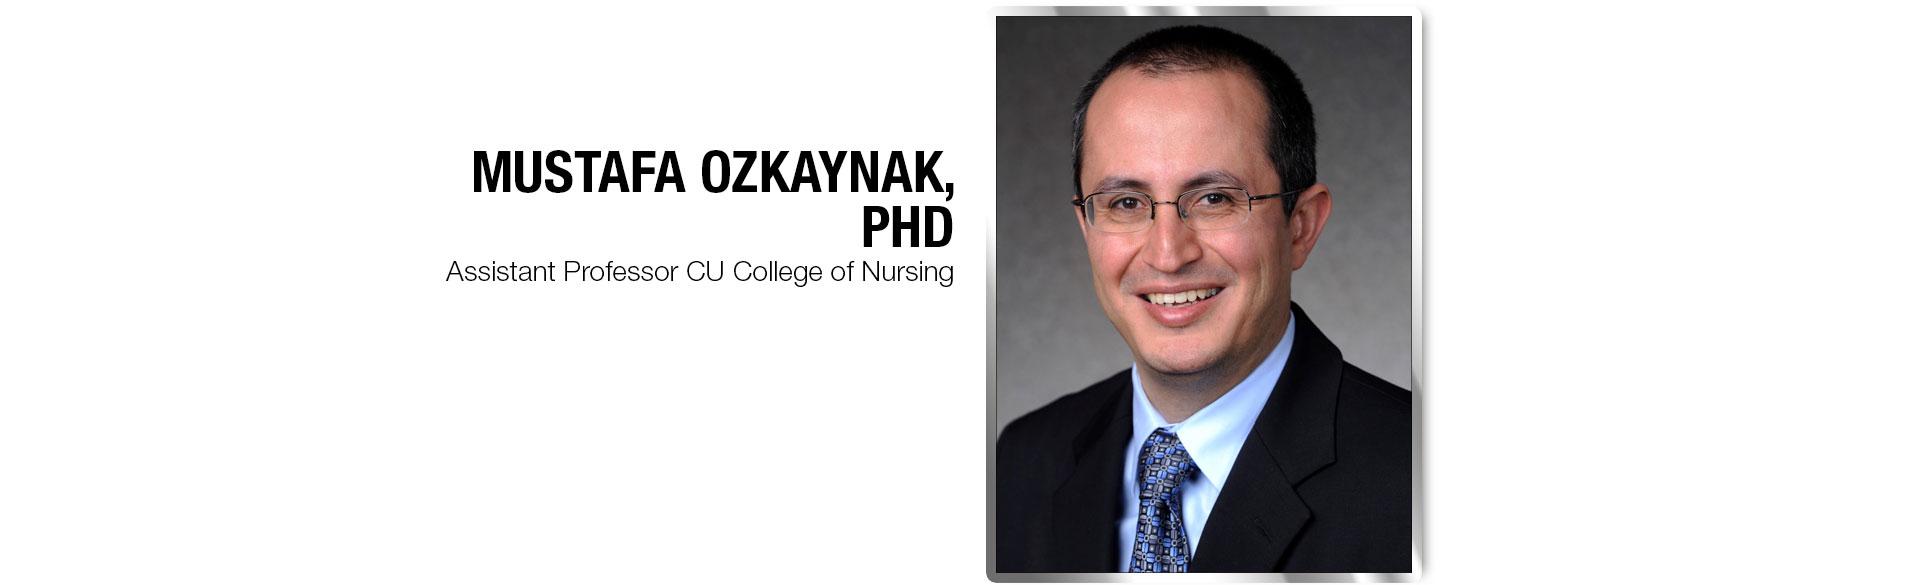 CU College of Nursing faculty Mustafa Ozkaynak, PhD